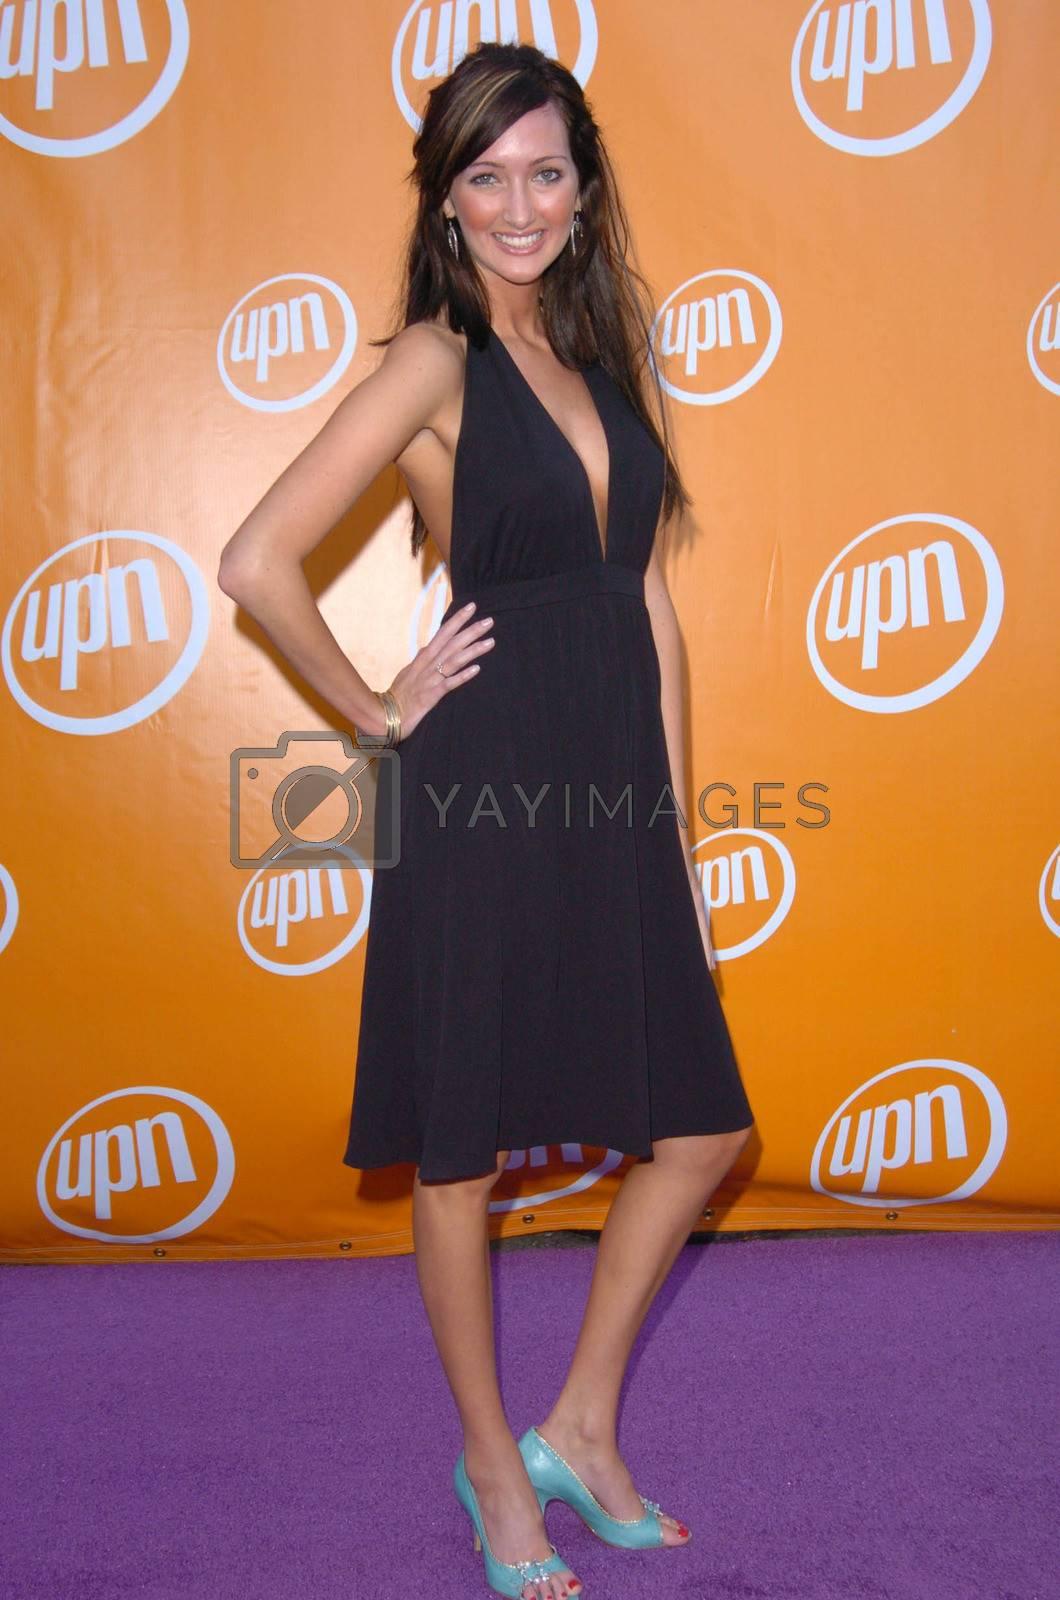 Norelle Van Herk At the UPN Summer TCA Party, Paramount Studios, Hollywood, CA 07-21-05